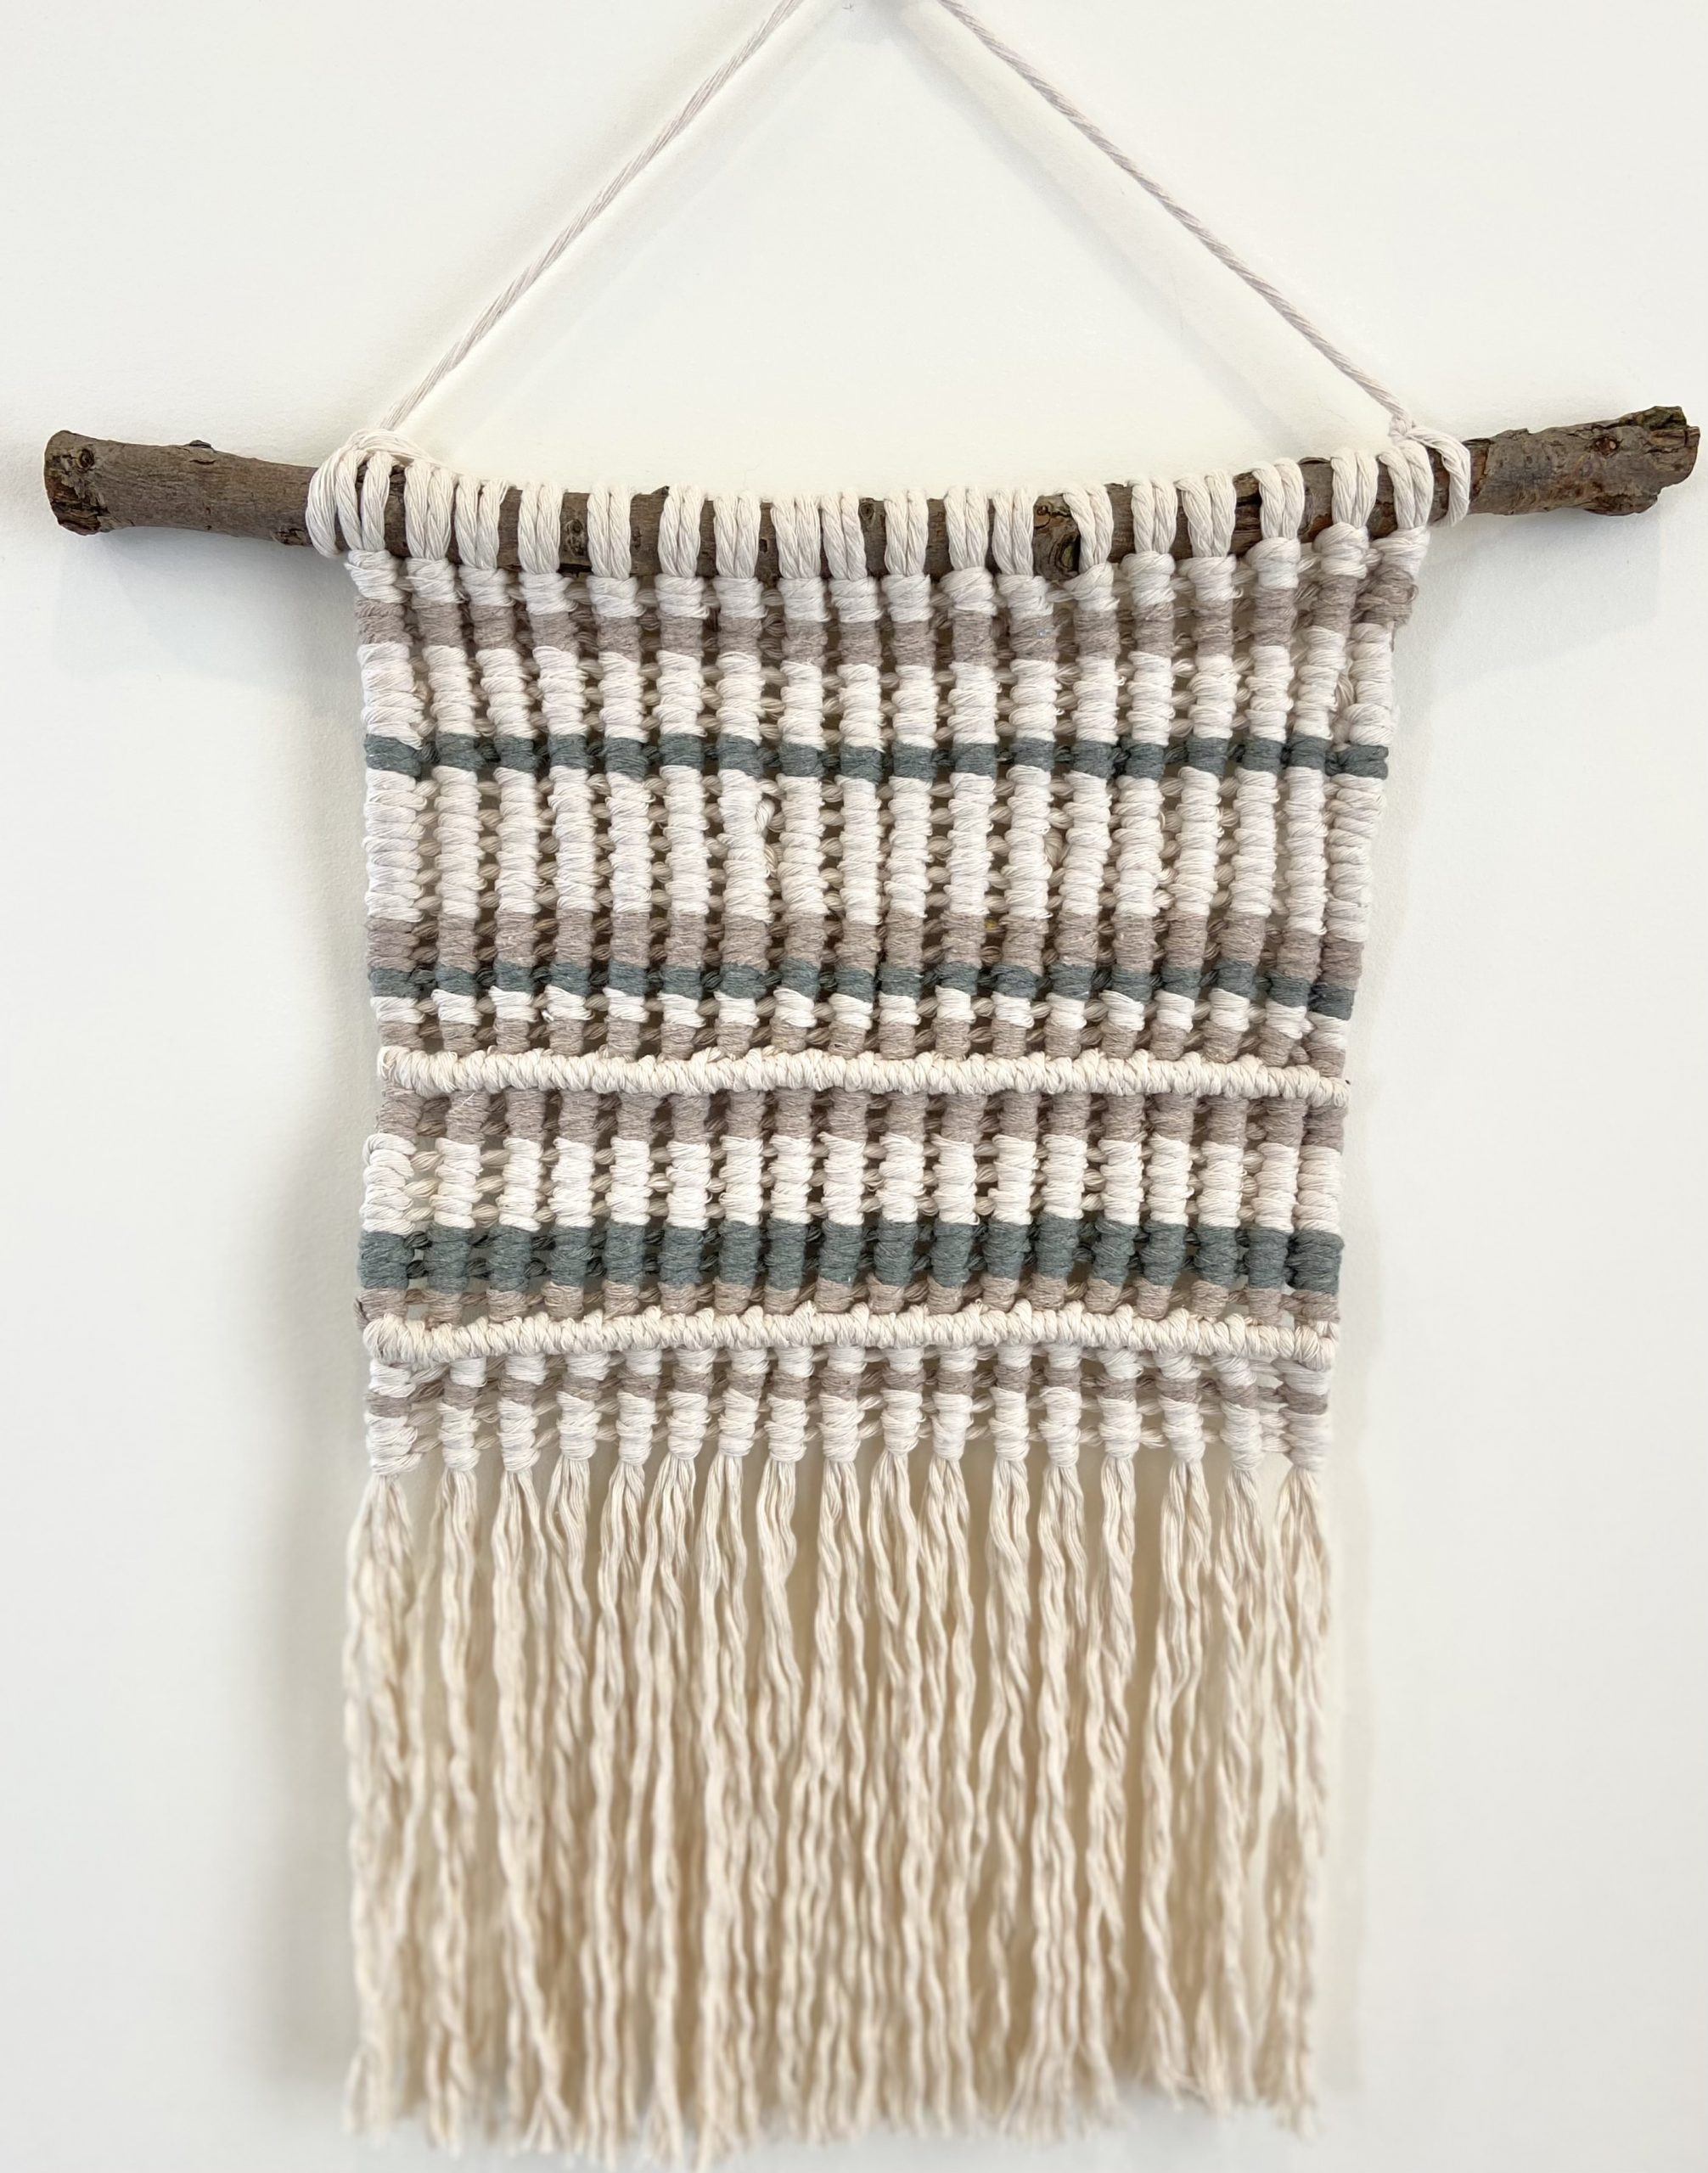 Sweaterhanging2